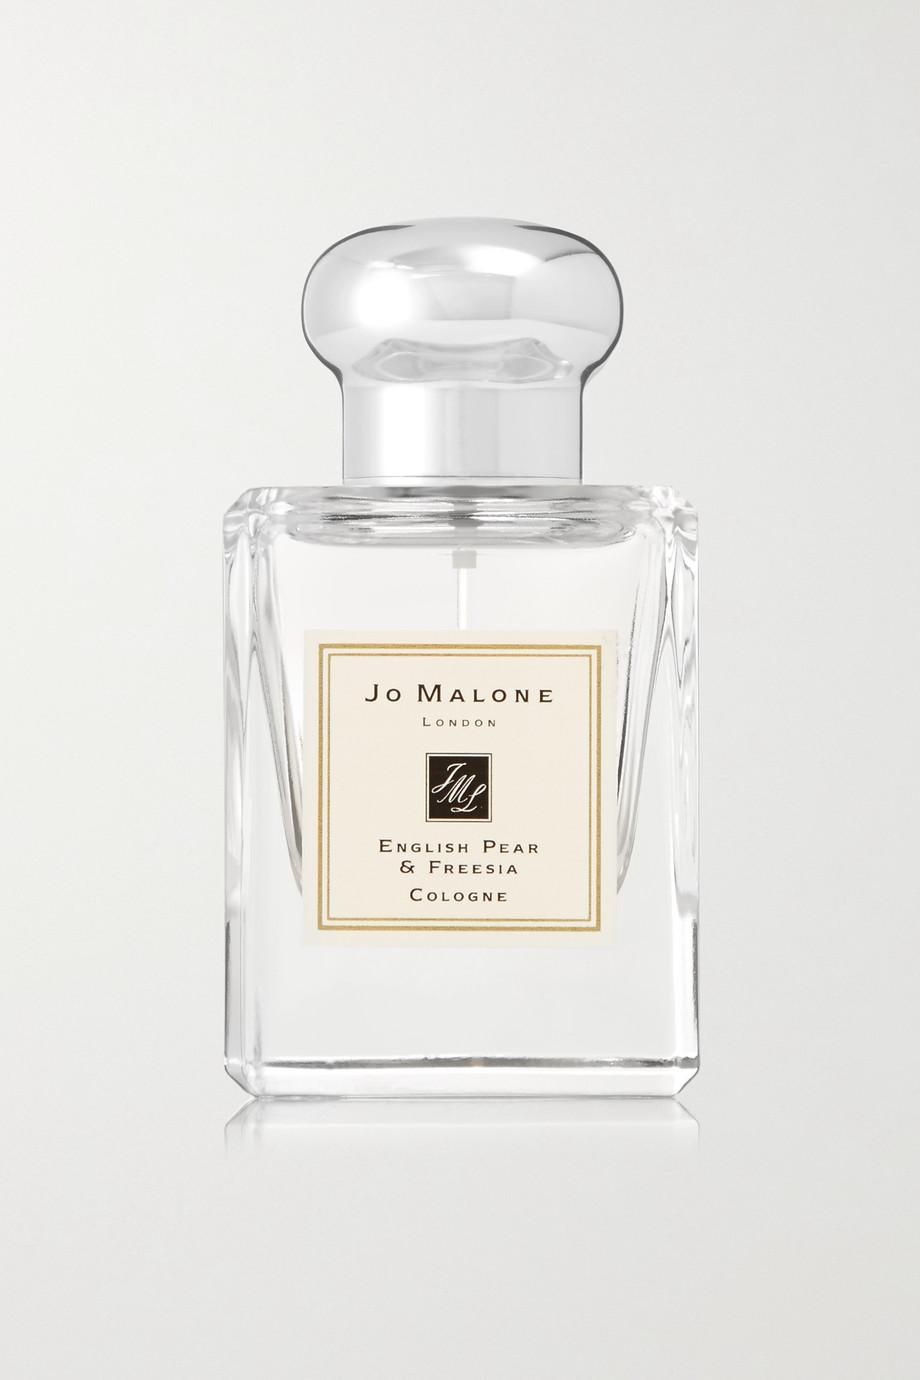 Jo Malone London English Pear & Freesia Cologne, 50ml